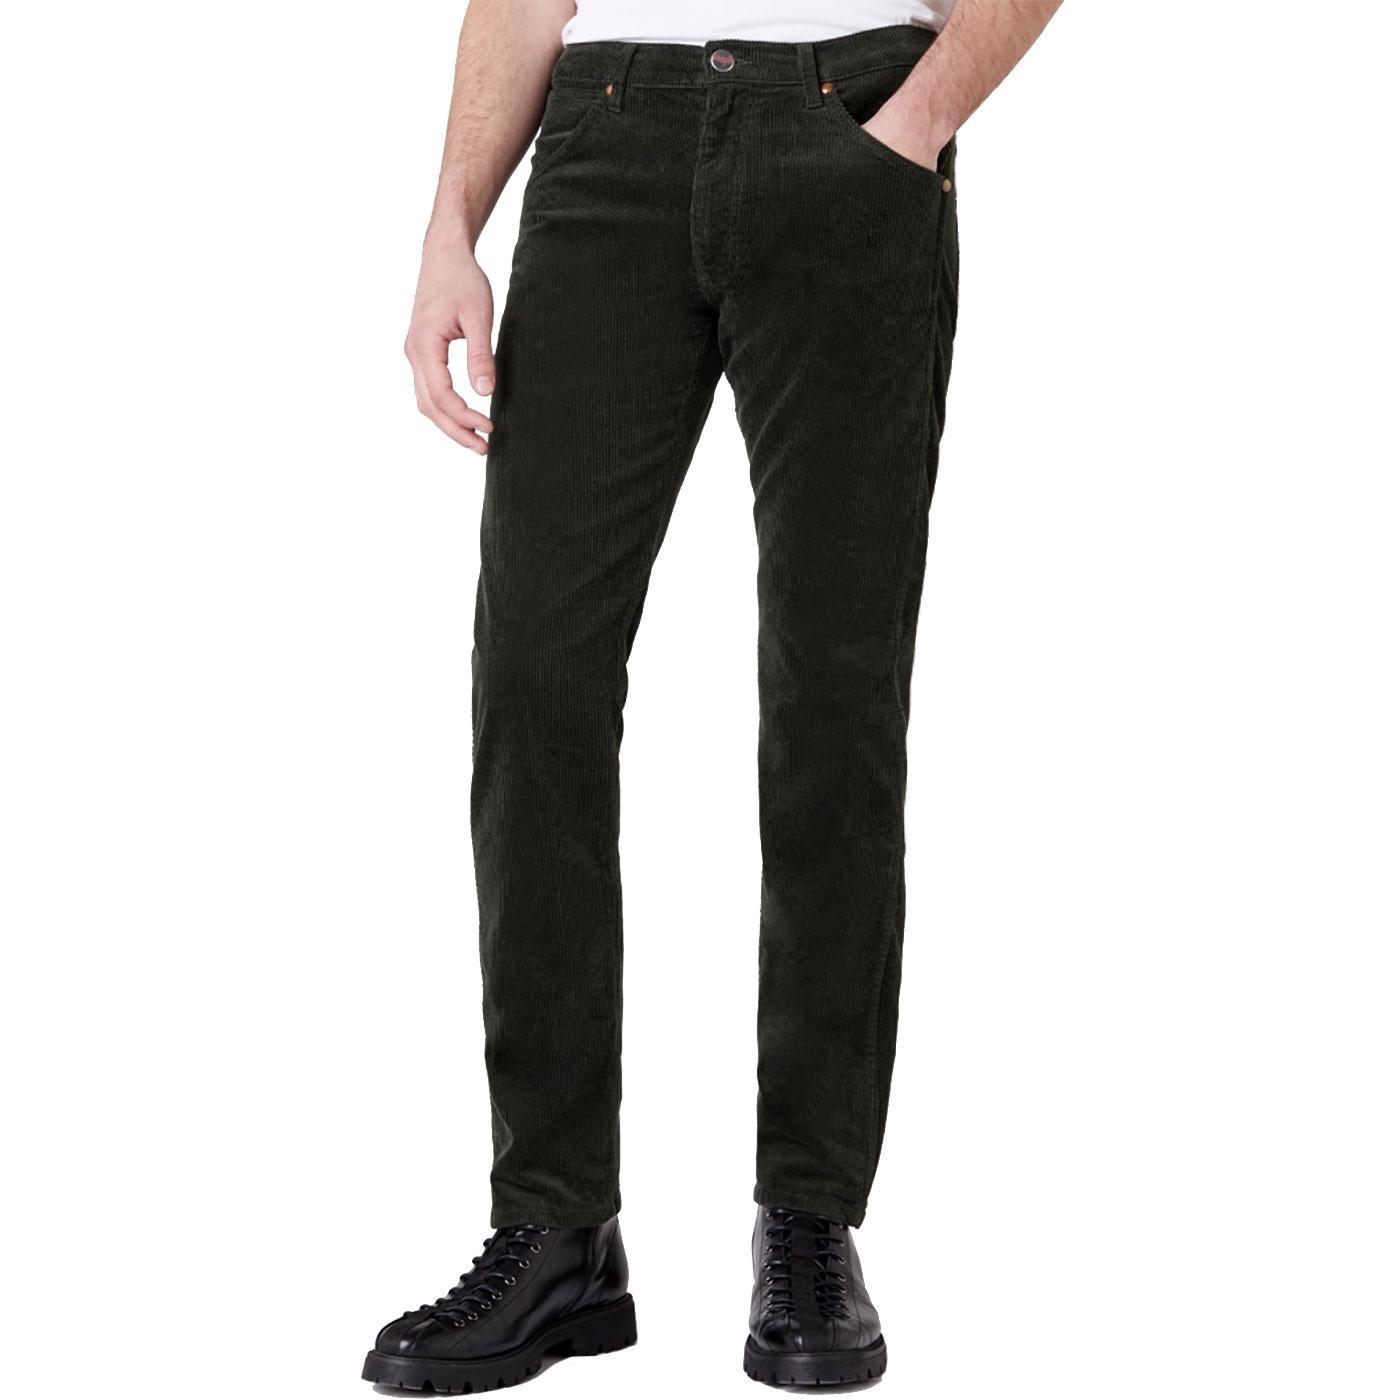 WRANGLER 11MWZ Retro Chunky 8 Wale Cord Jeans RG